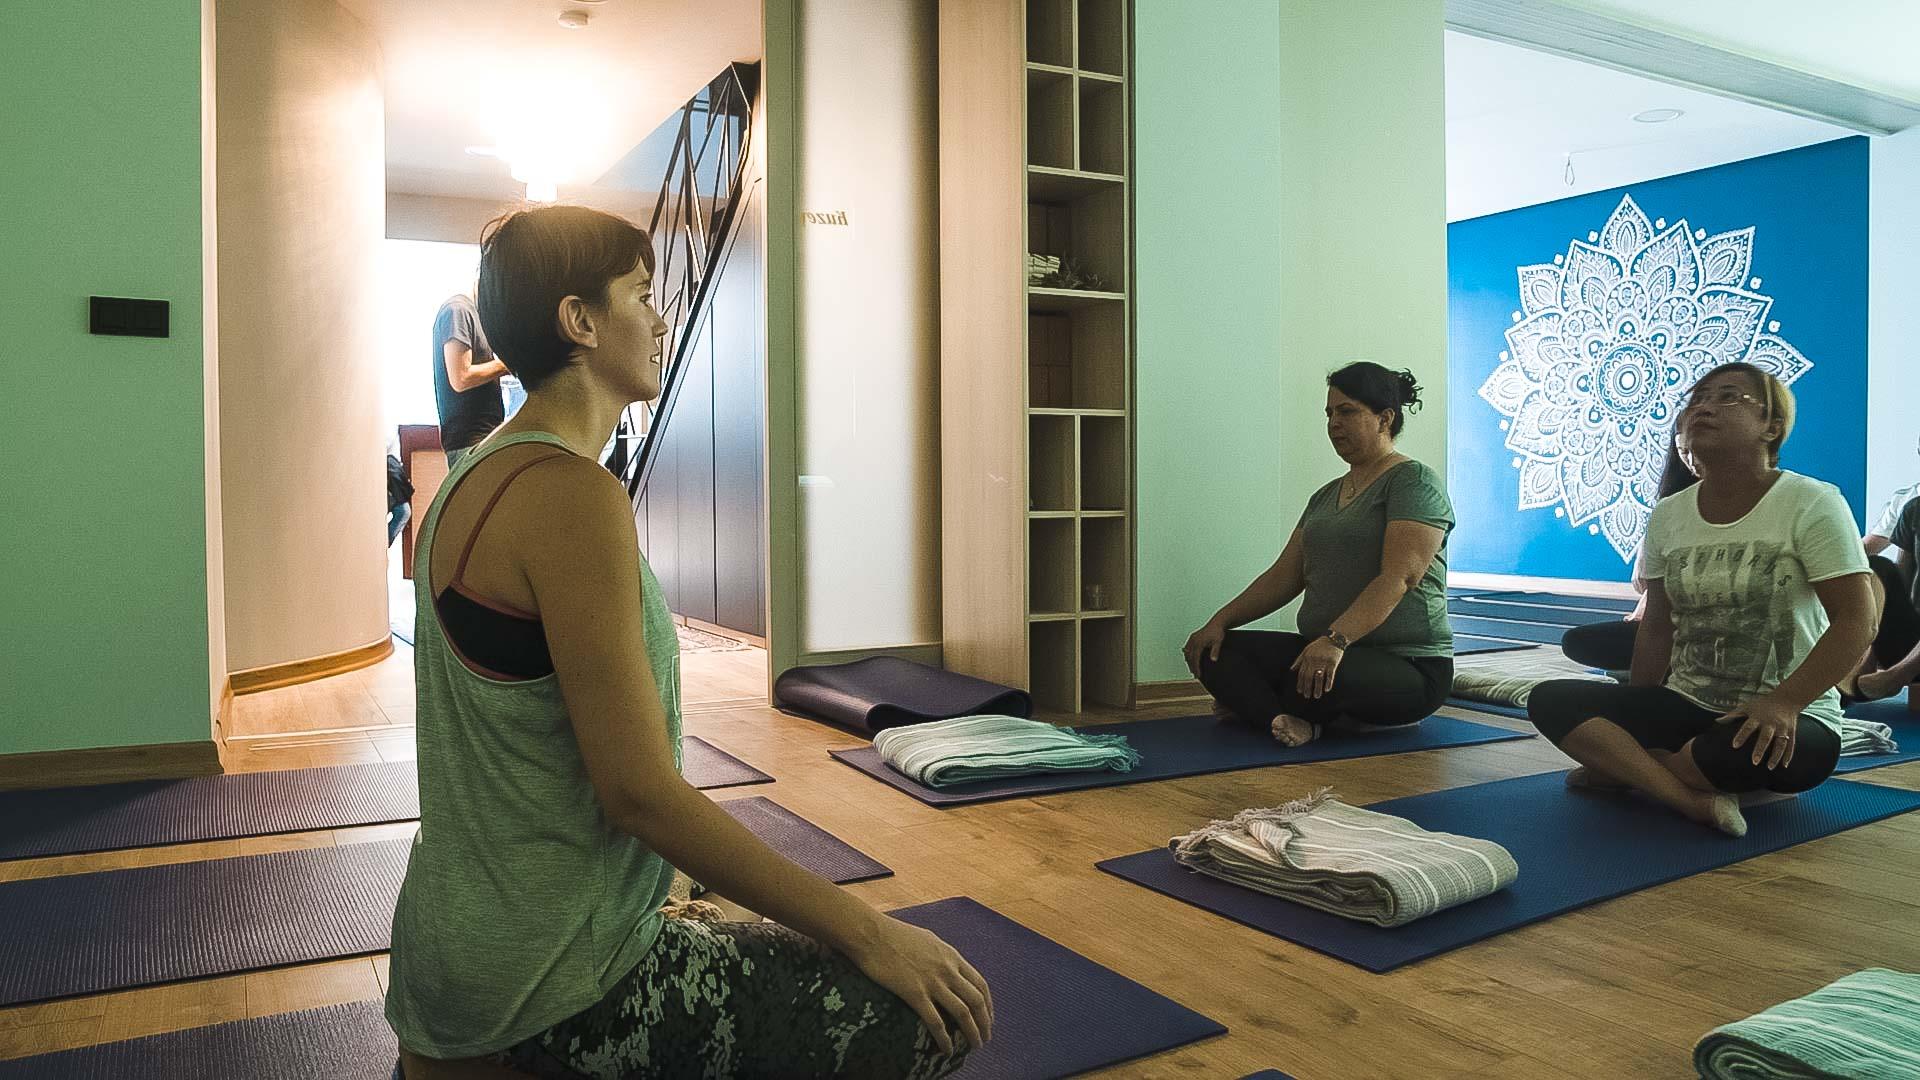 grup dersi, yoga, venüs sirius